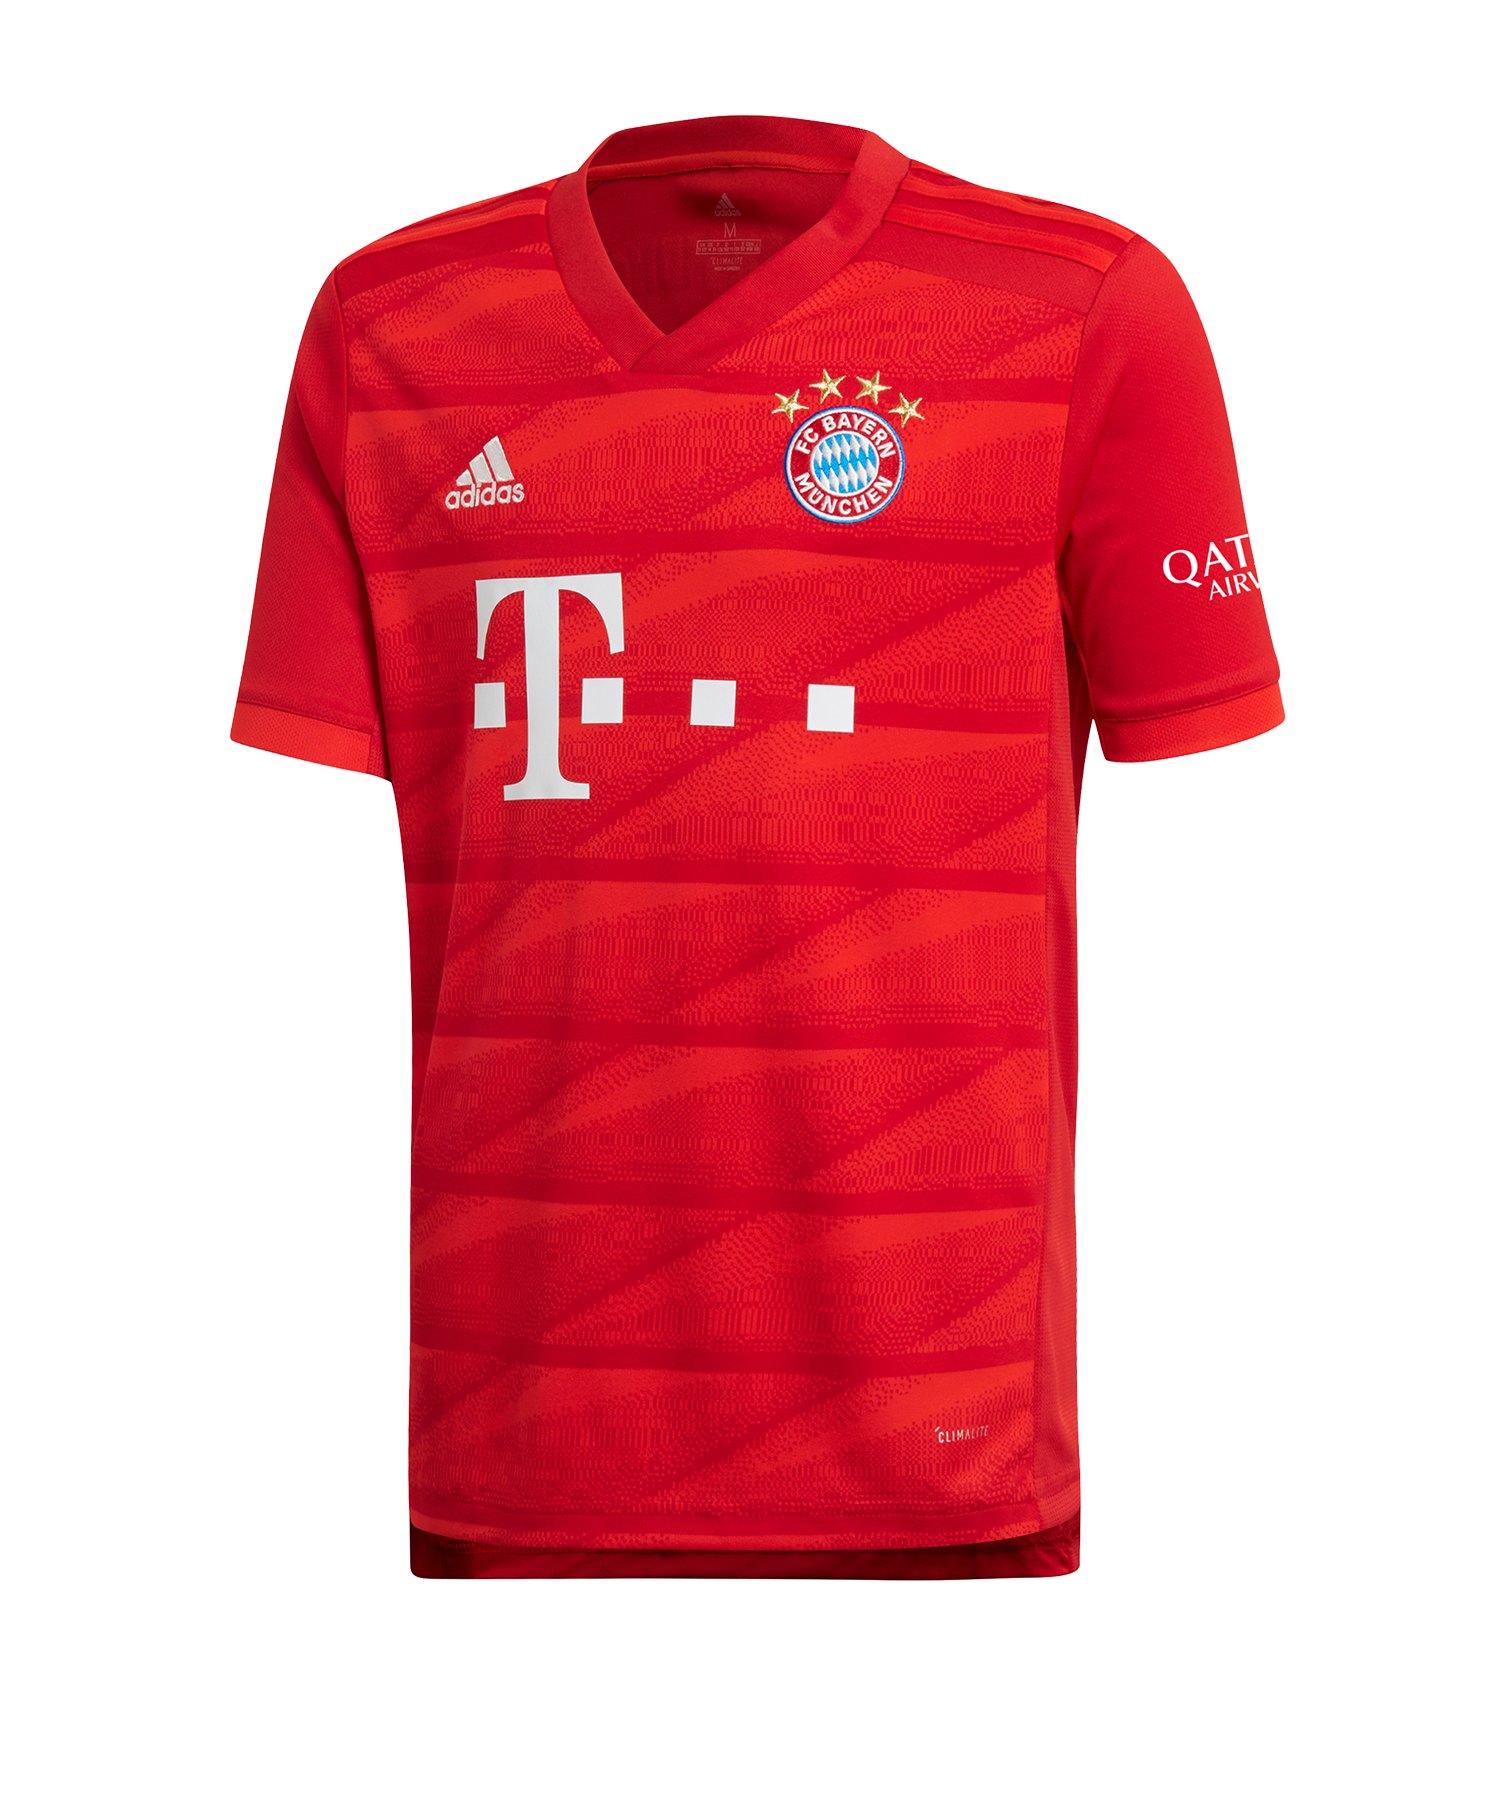 adidas FC Bayern München Trikot Home 2019/20 Kids - Rot